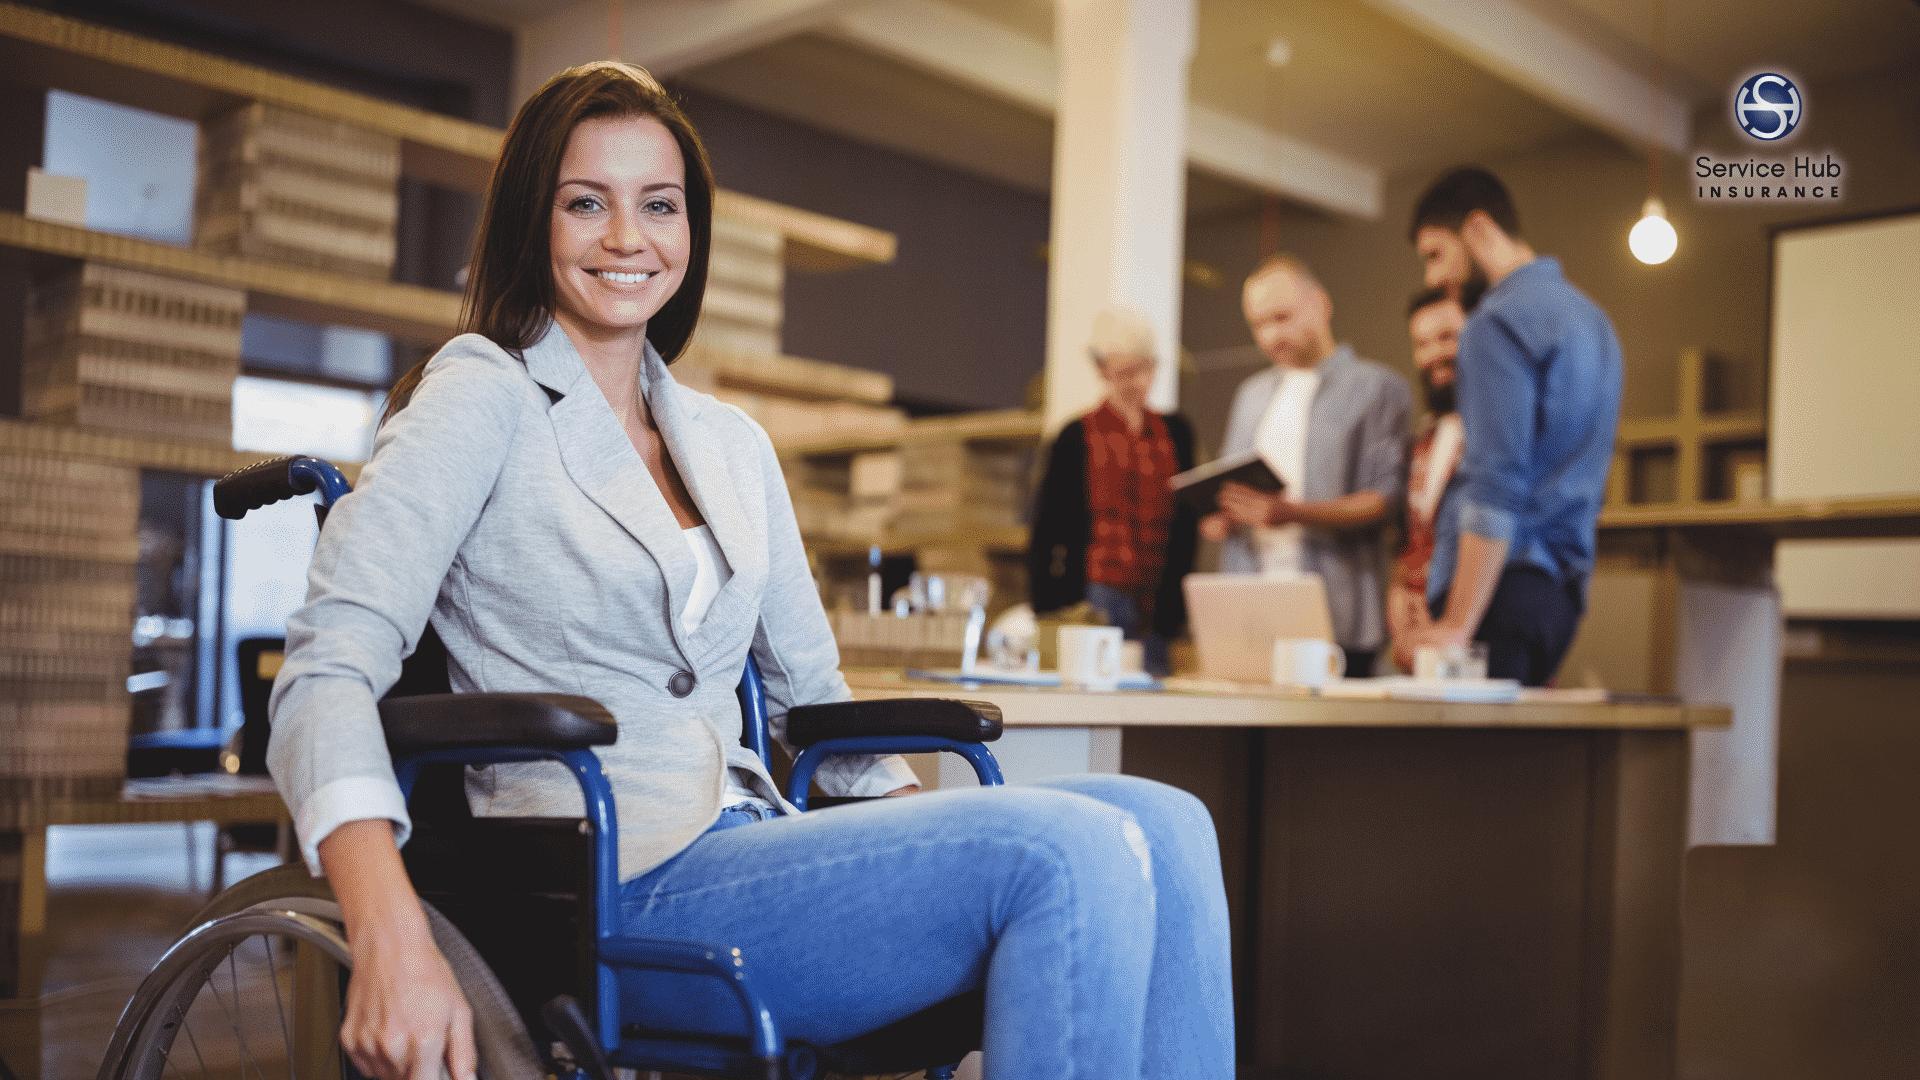 Disability Insurance - Service Hub Insurance